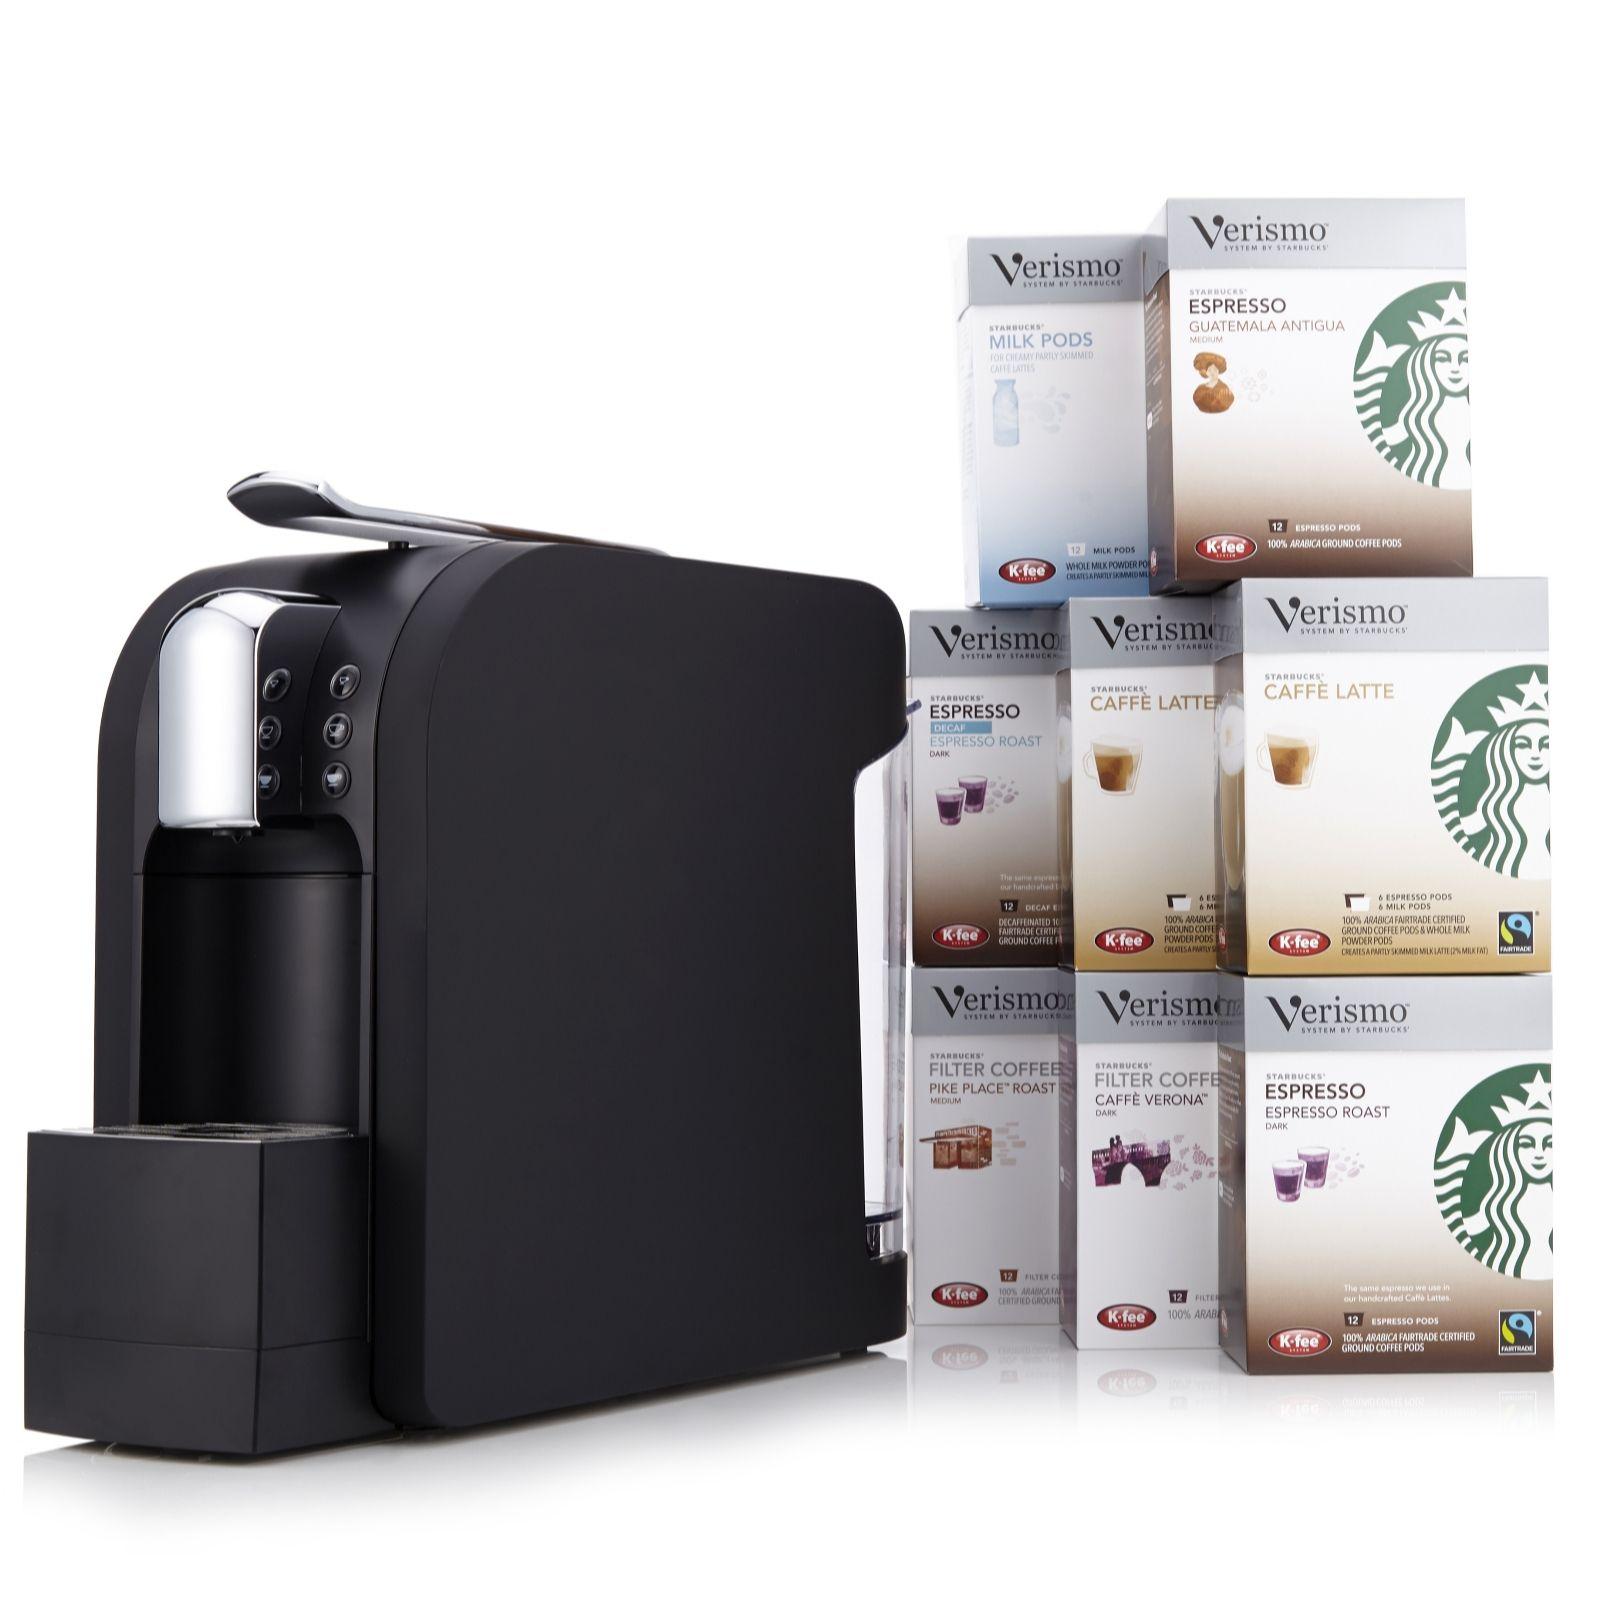 Starbucks Verismo 580 Brewer Coffee Machine With 96 Coffee Milk Pods Qvc Uk